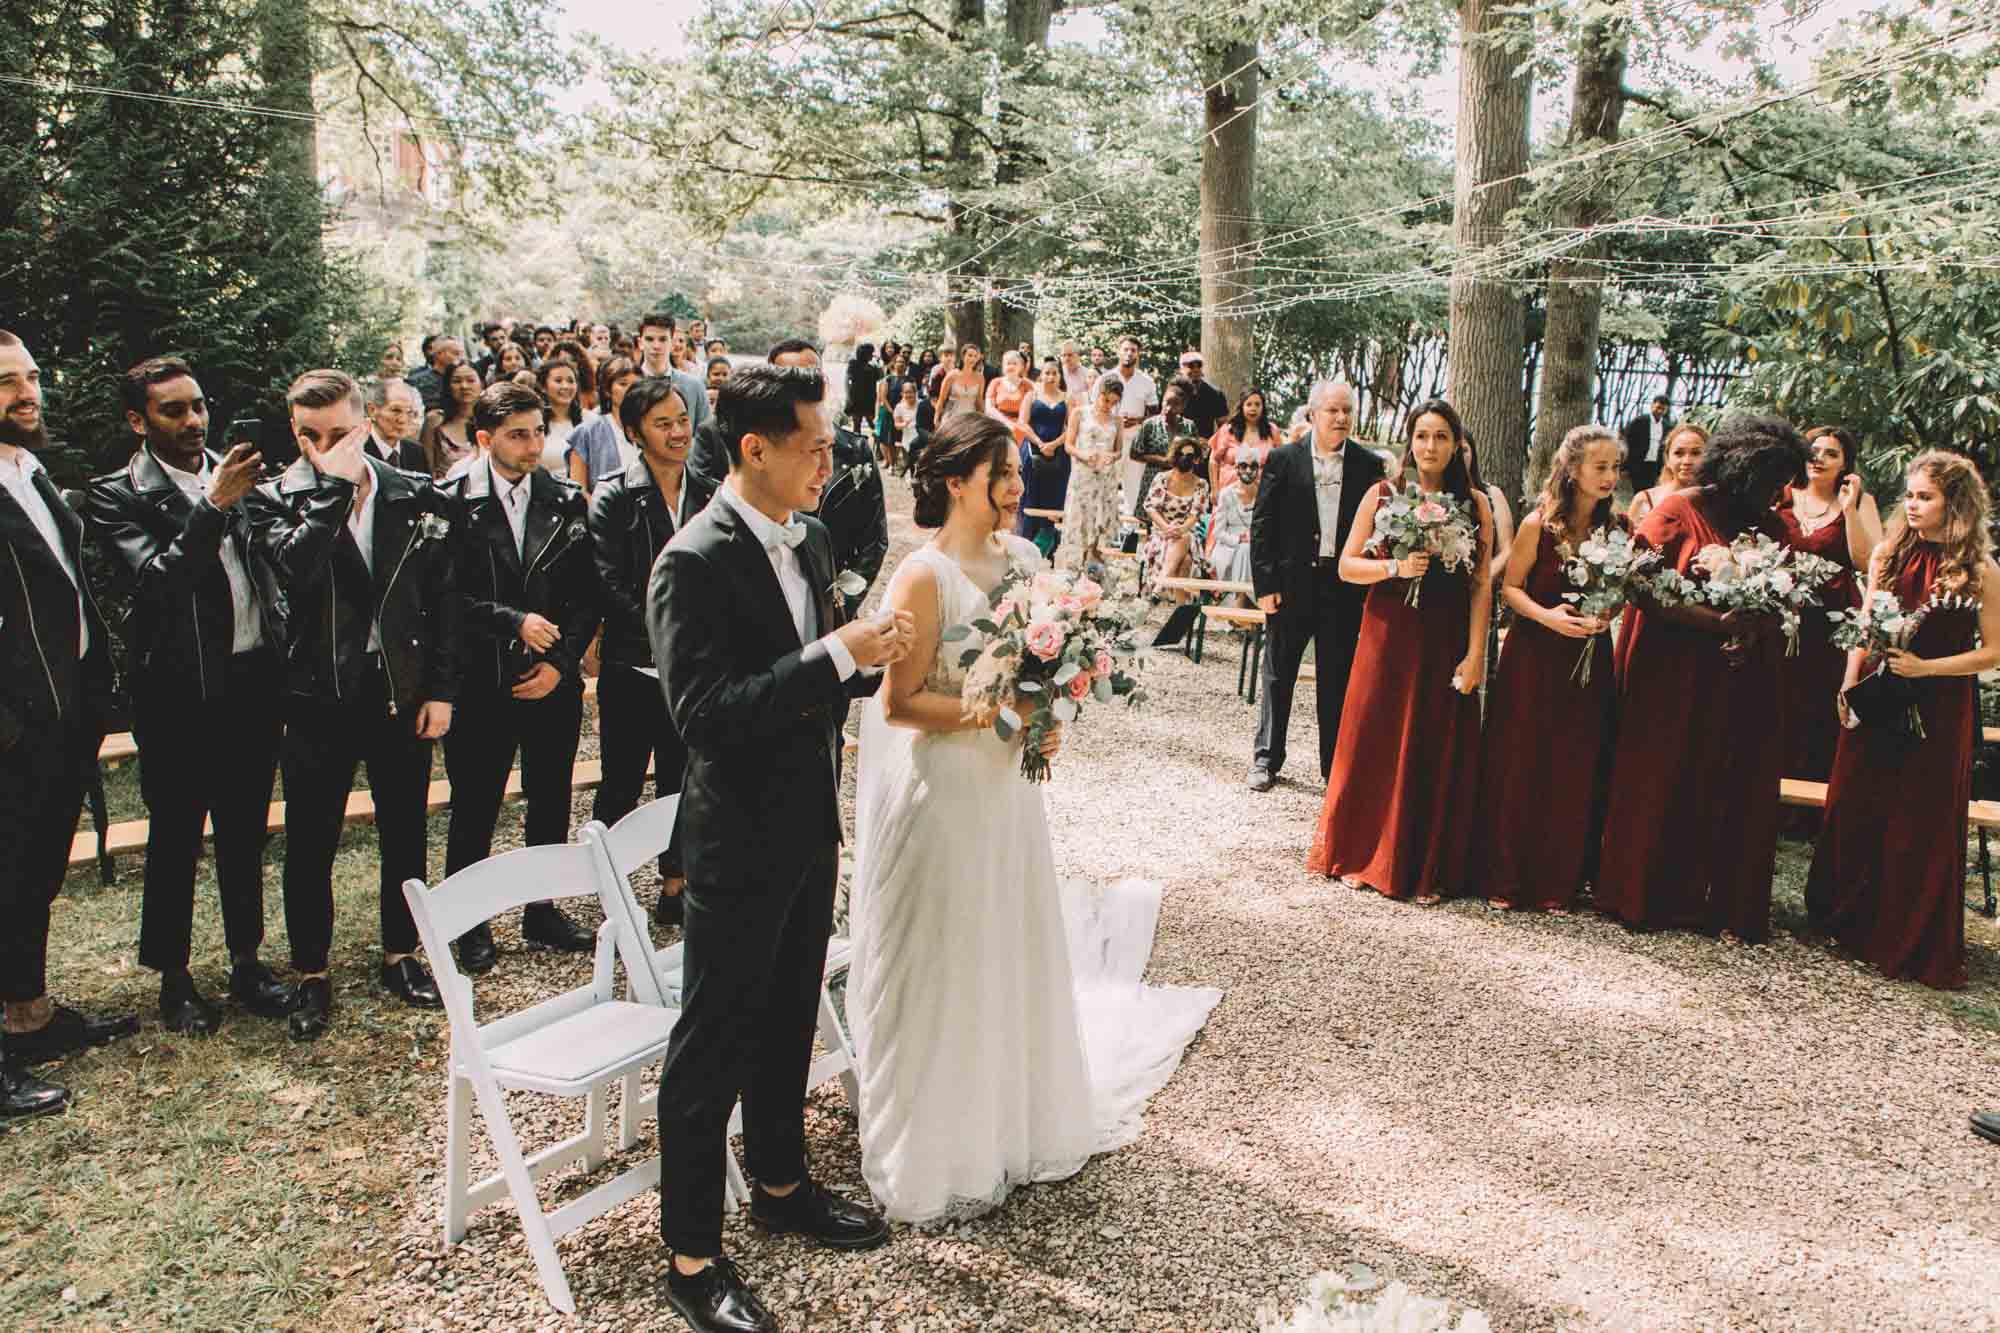 SOPHIA+THIBAUD_MANOIR SAINT HUBERT_PHOTOGRAPHE_MARIAGE_LES BANDITS-17